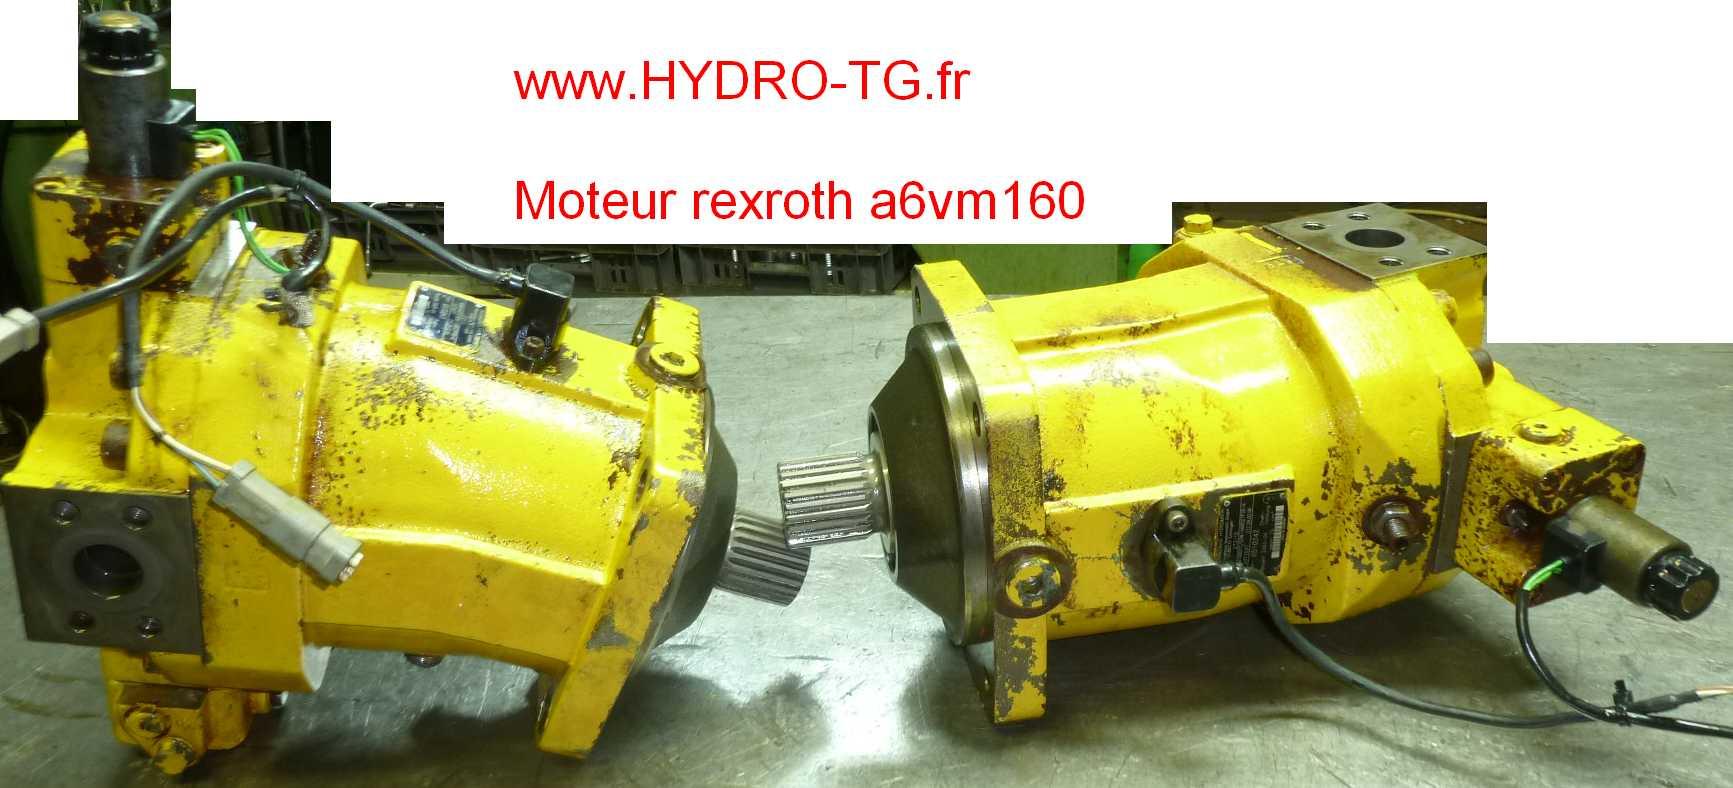 renovation moteur hydraulique Bruninghaus Hydromatik a6vm160